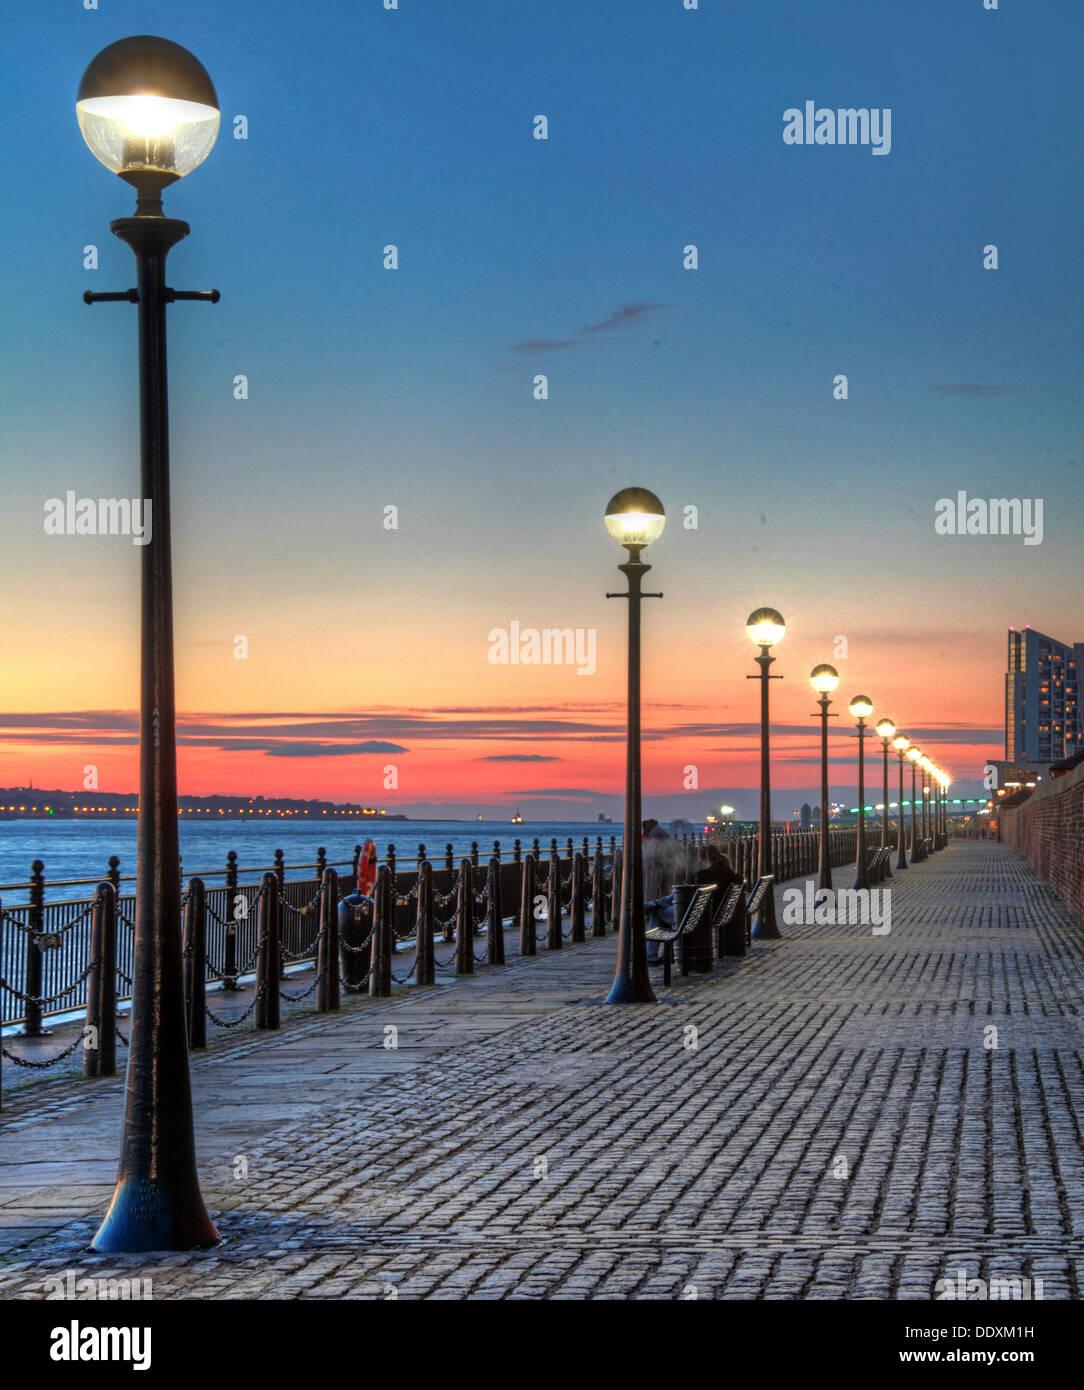 Albert Dock at Nighttime liverpool Merseyside England UK - Stock Image